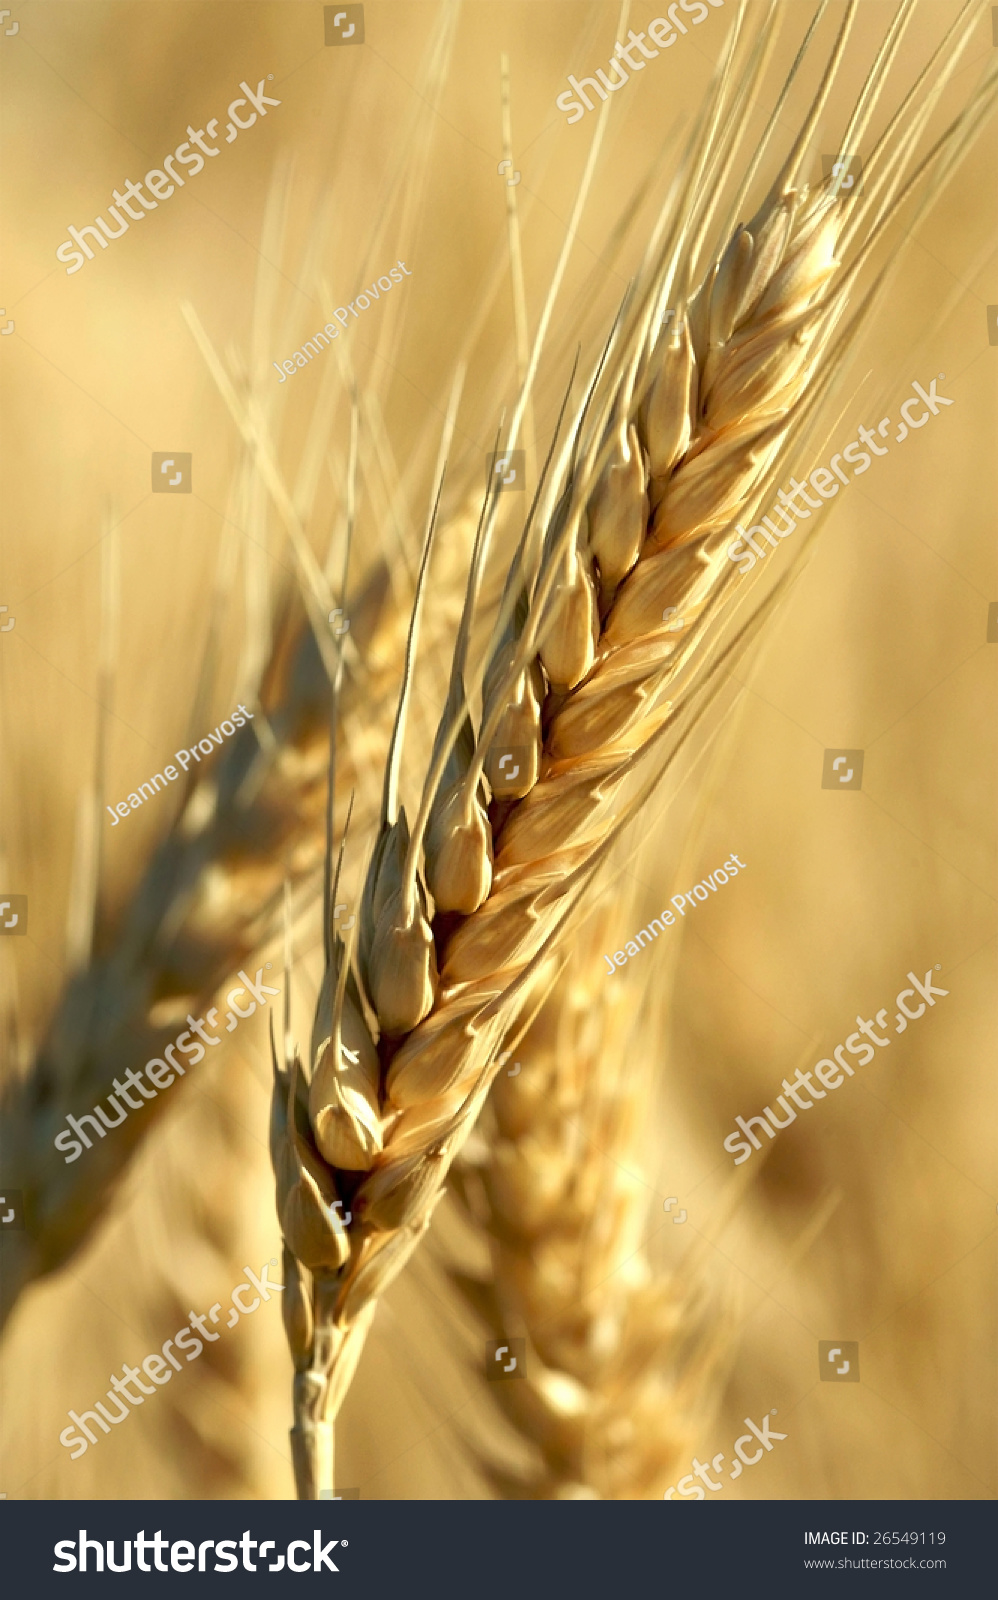 Single Stalk Of Wheat In Morning Light Stock Photo ...